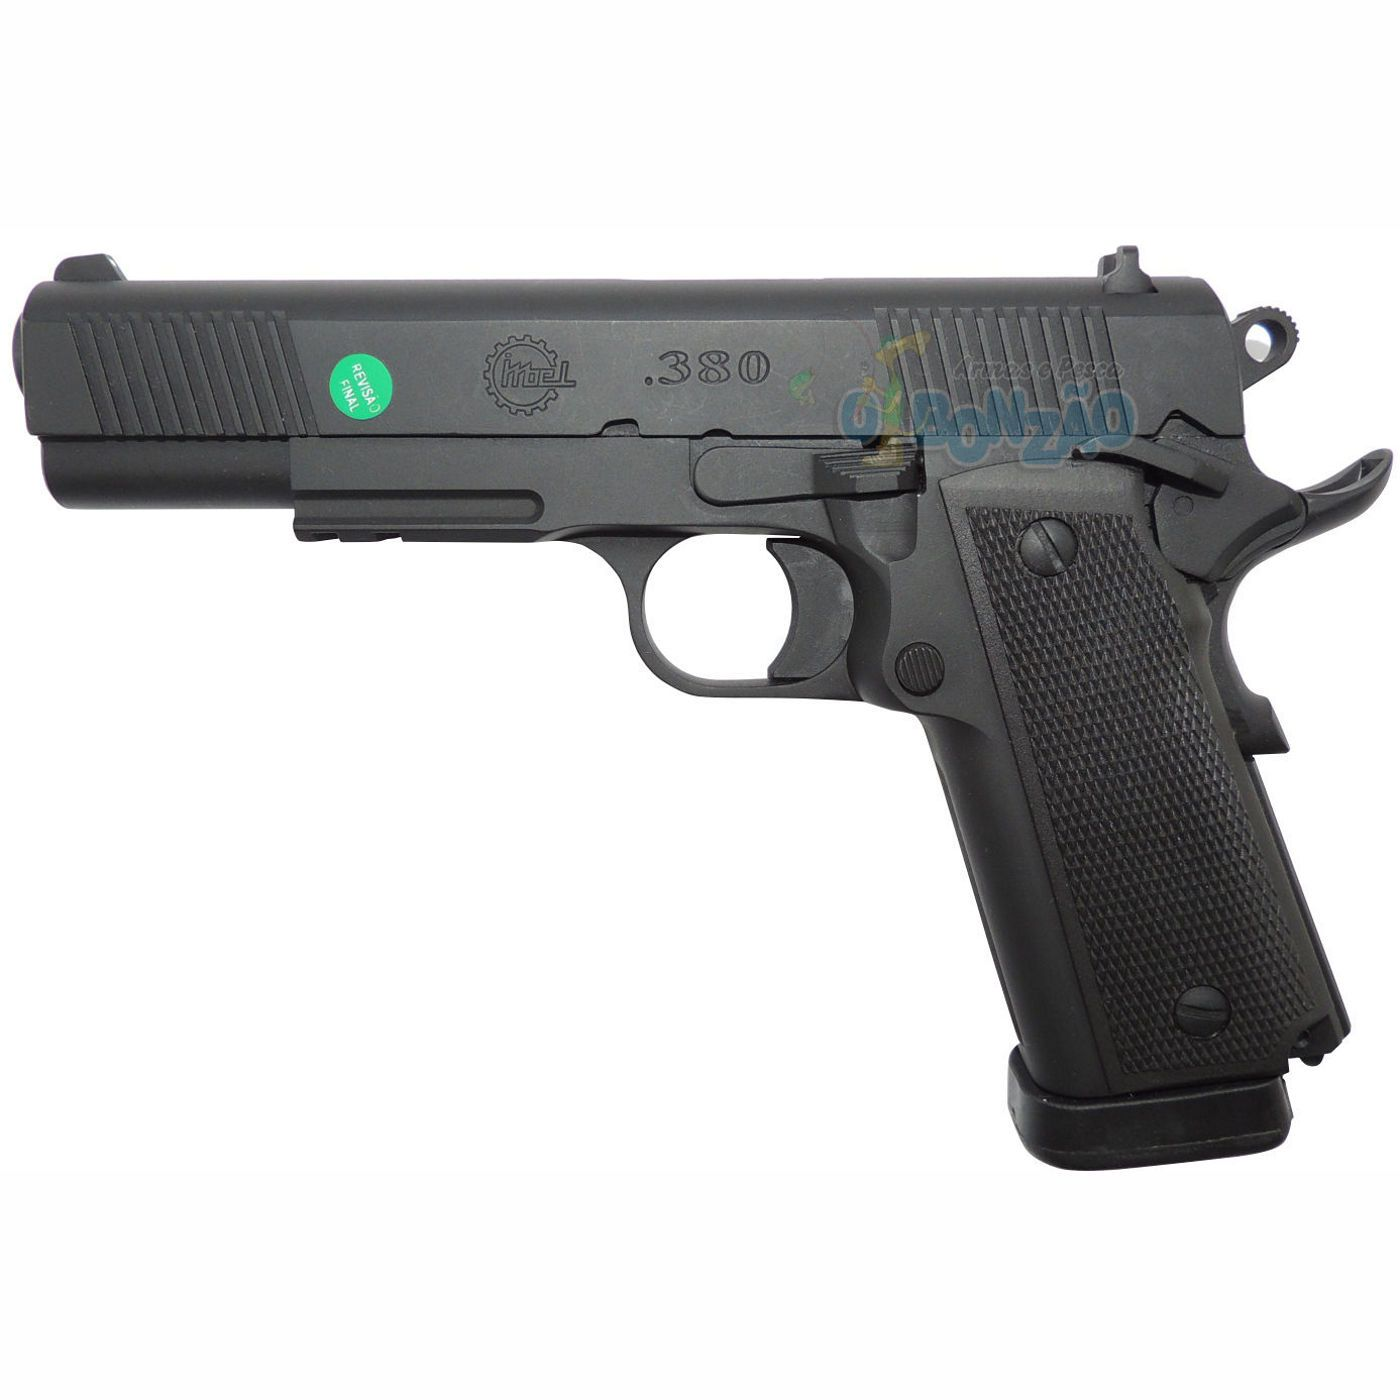 Pistola Imbel MD2 LX GC Cal .380 ACP 19+1 Tiros Oxidada